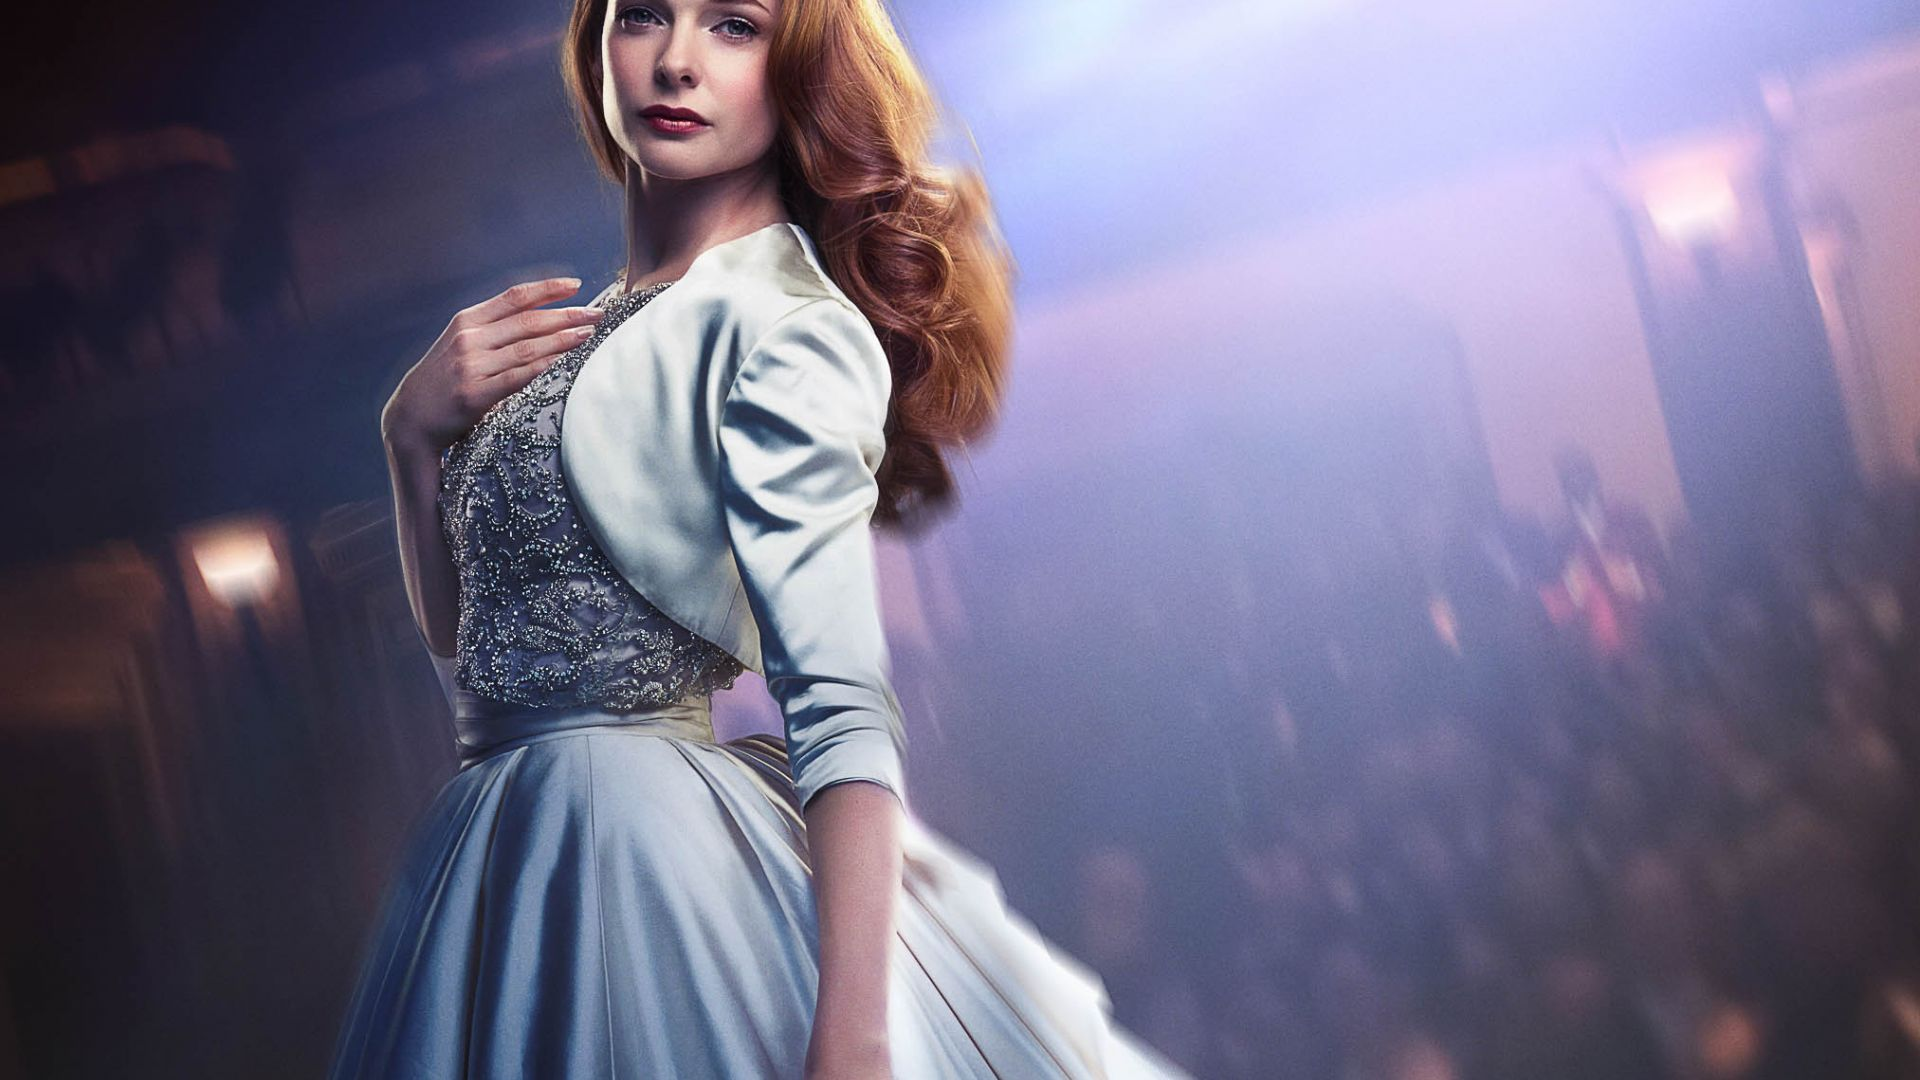 Desktop Wallpaper Rebecca Ferguson, Movie, Actress, The ...